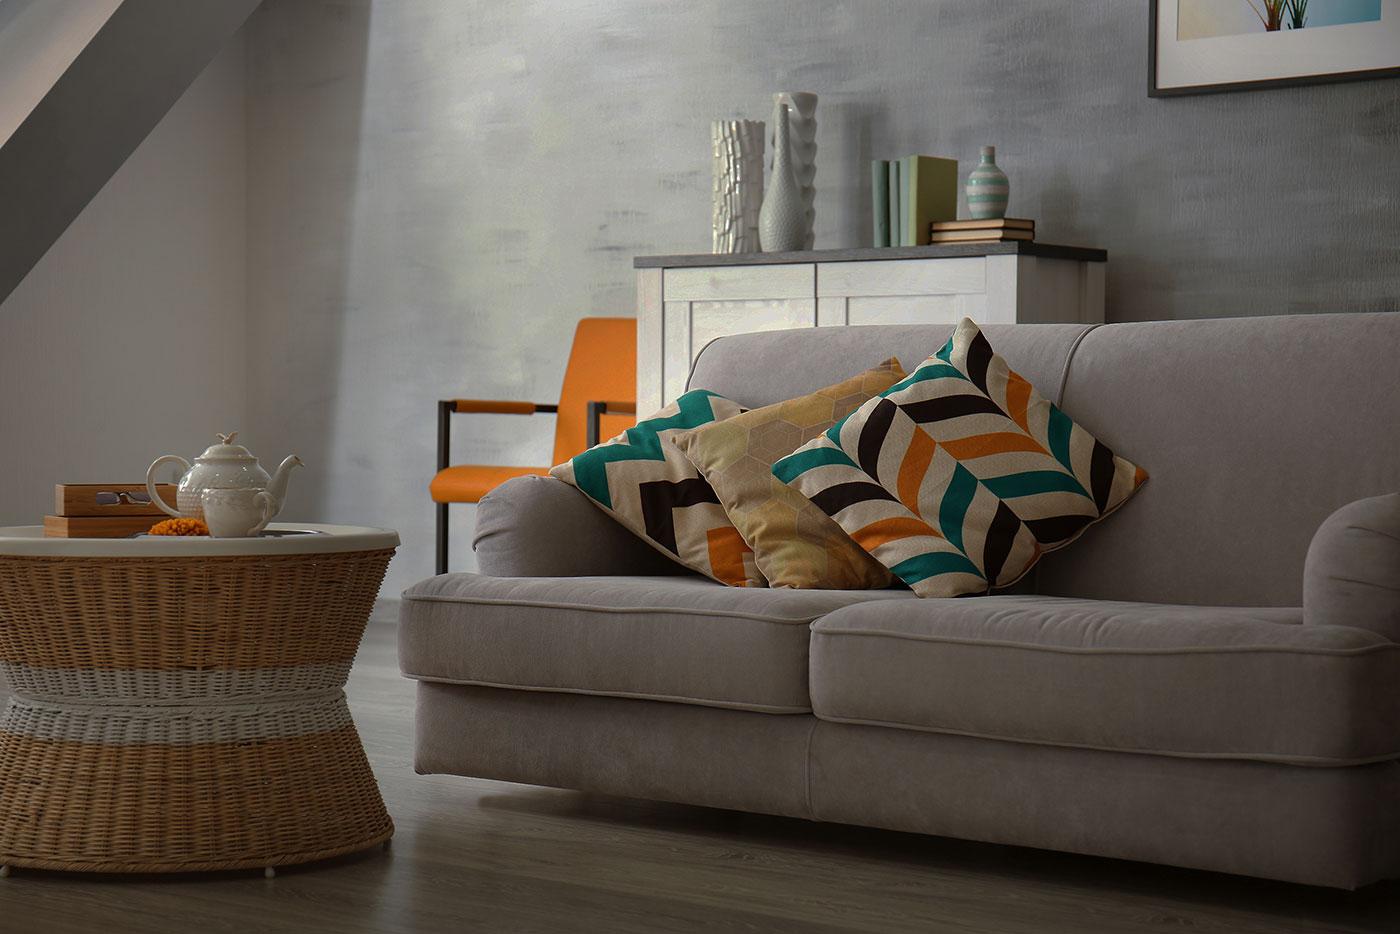 Pittsburgh Furniture modern sofa example